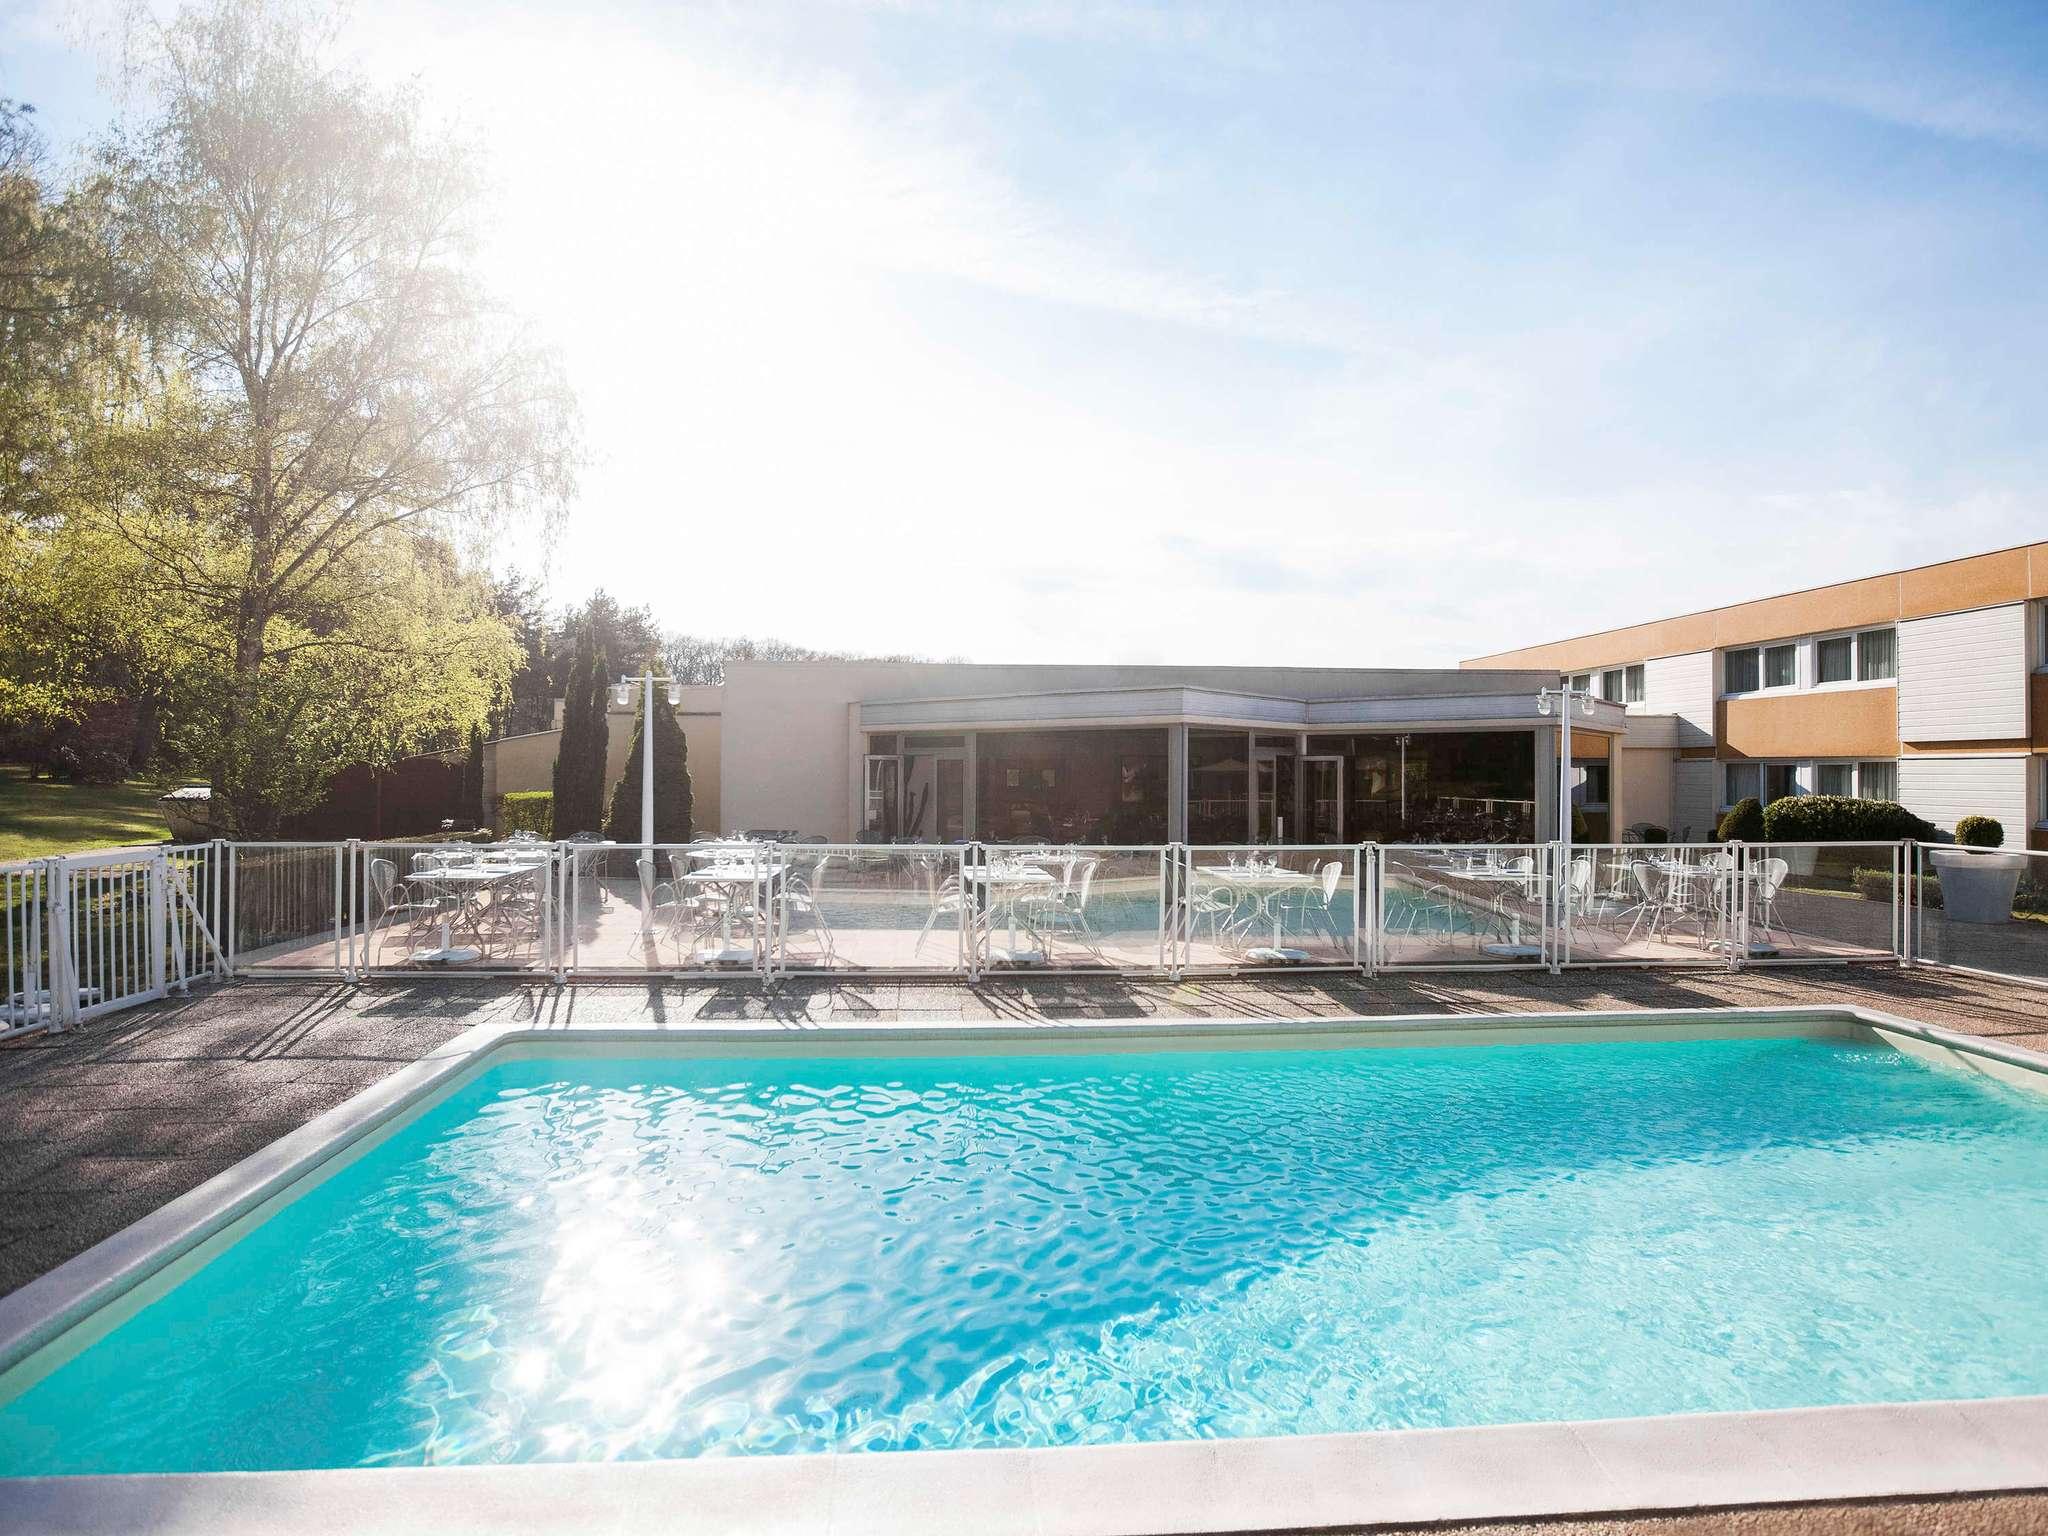 Hotel – Novotel Saint-Avold